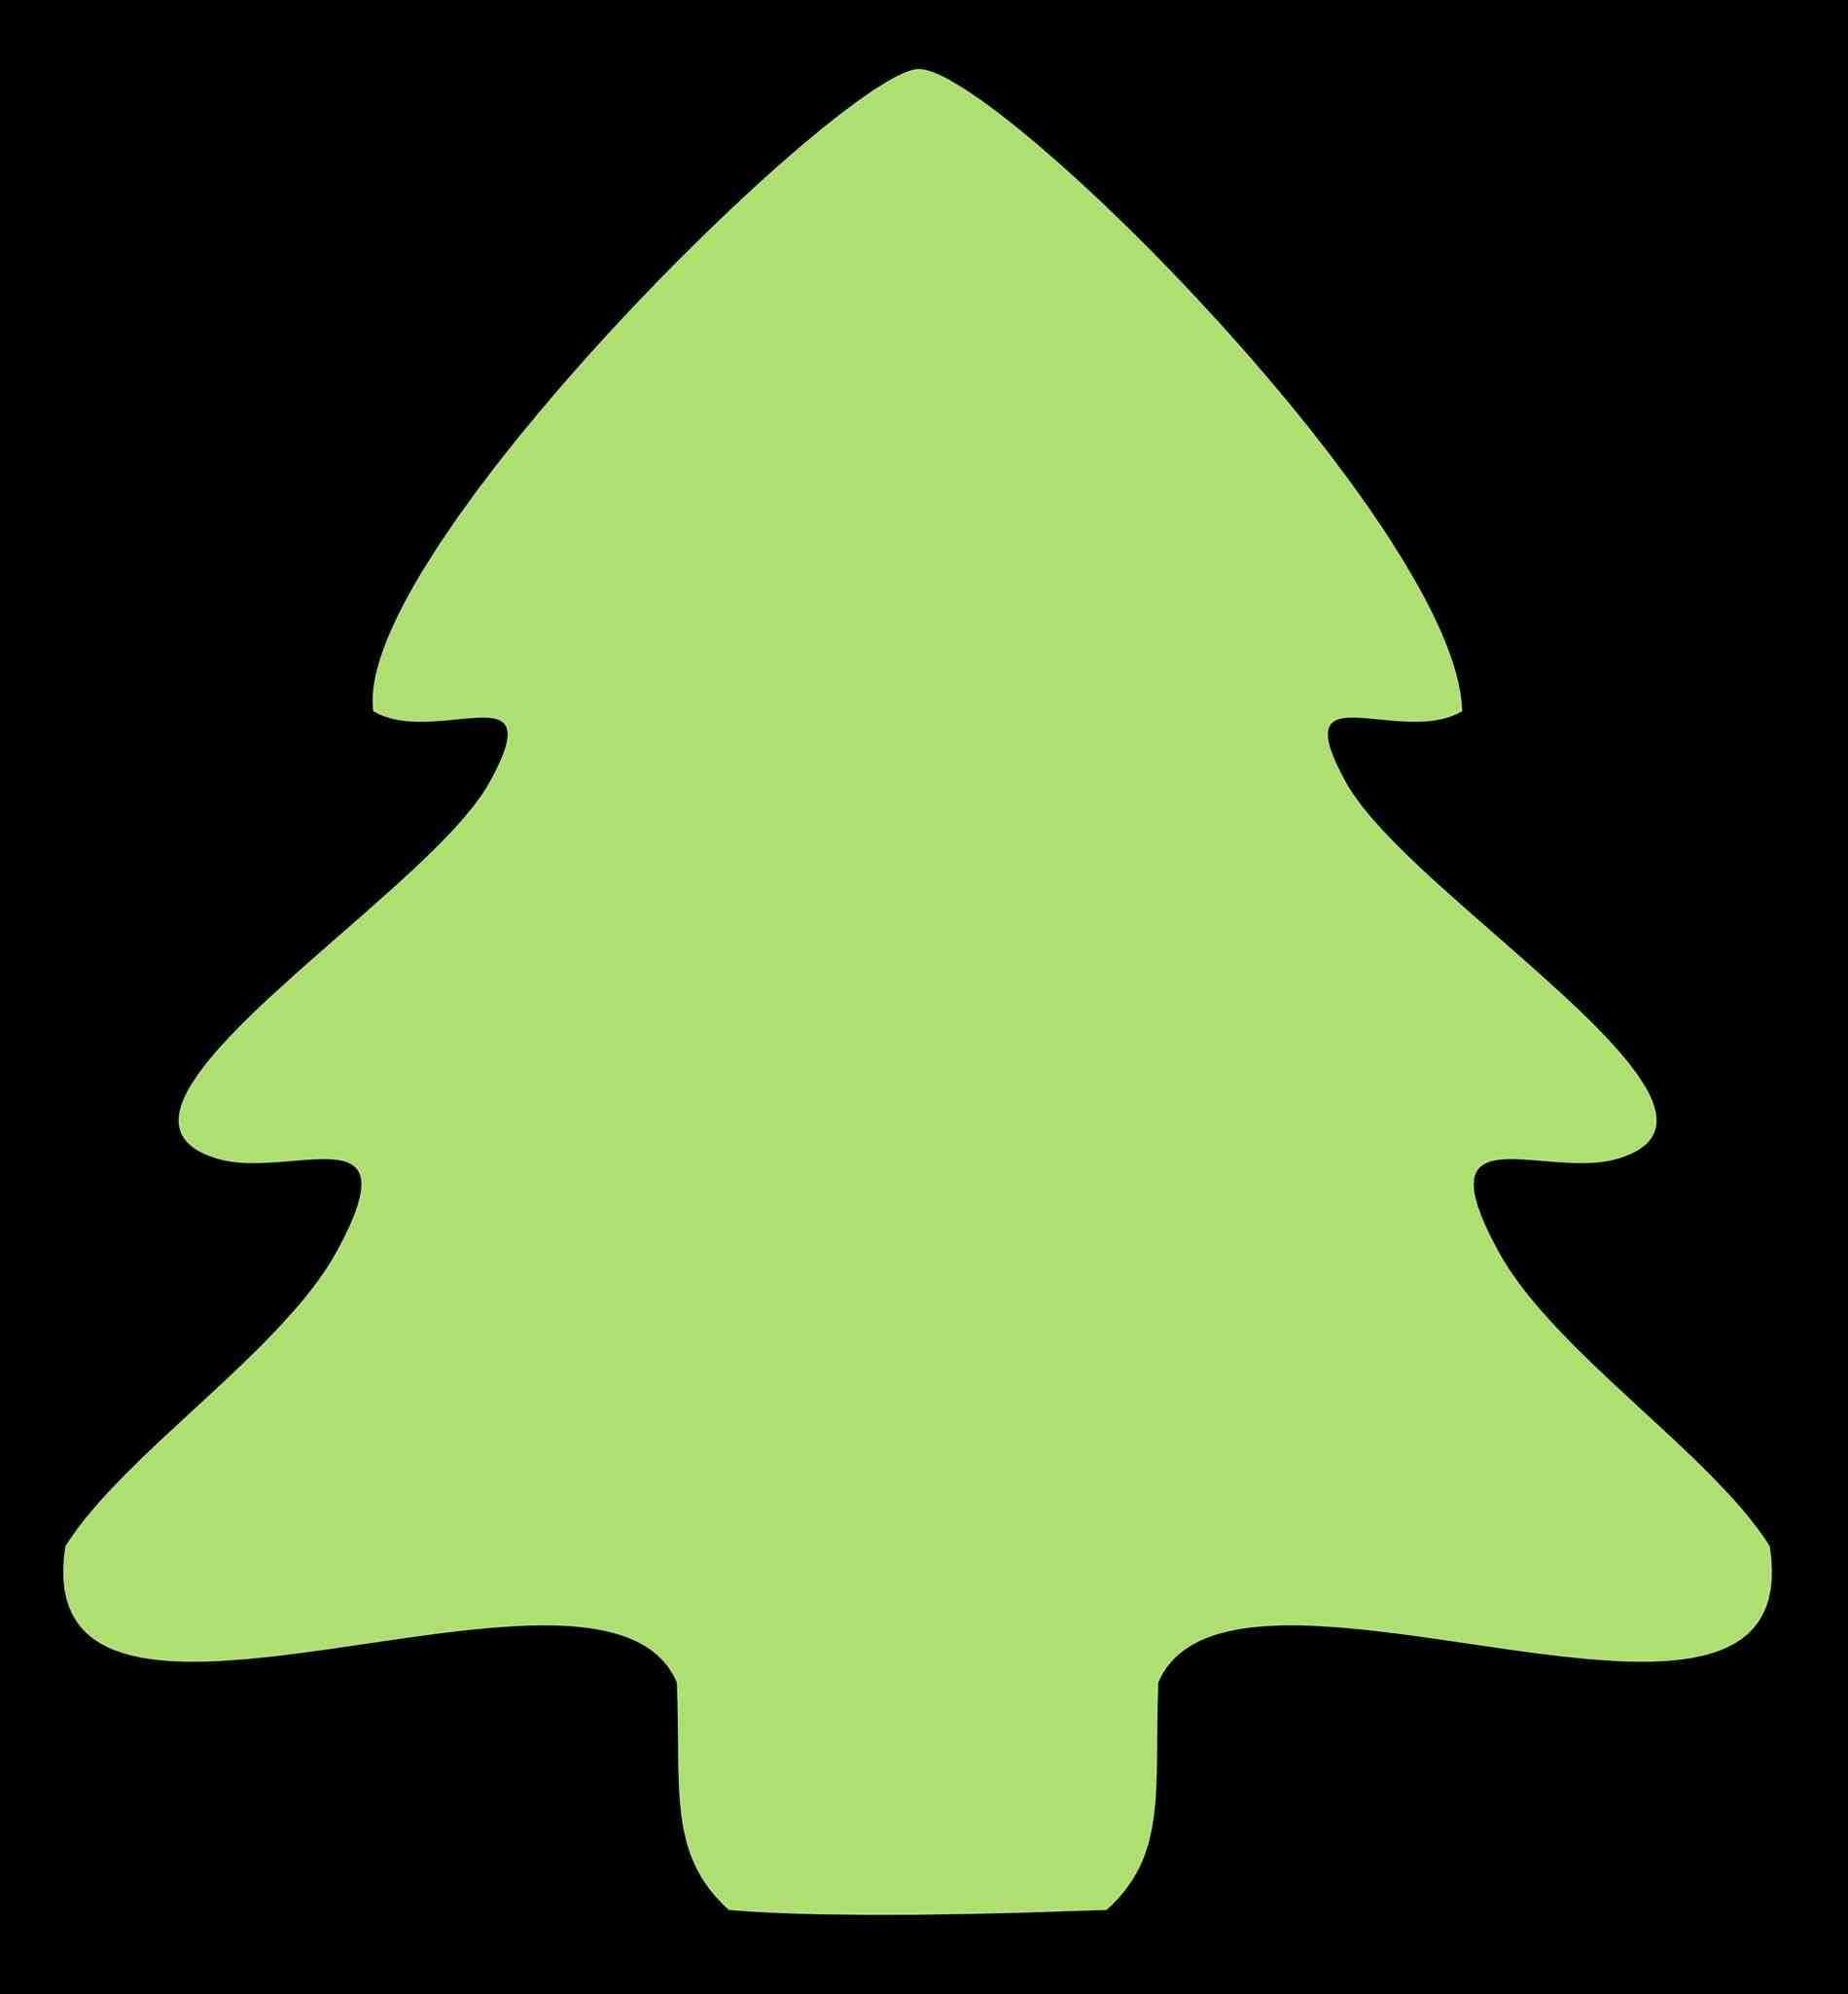 New Post Christmas Tree Border Clip Art Black And White Xmast Rh Ca Clipart Star